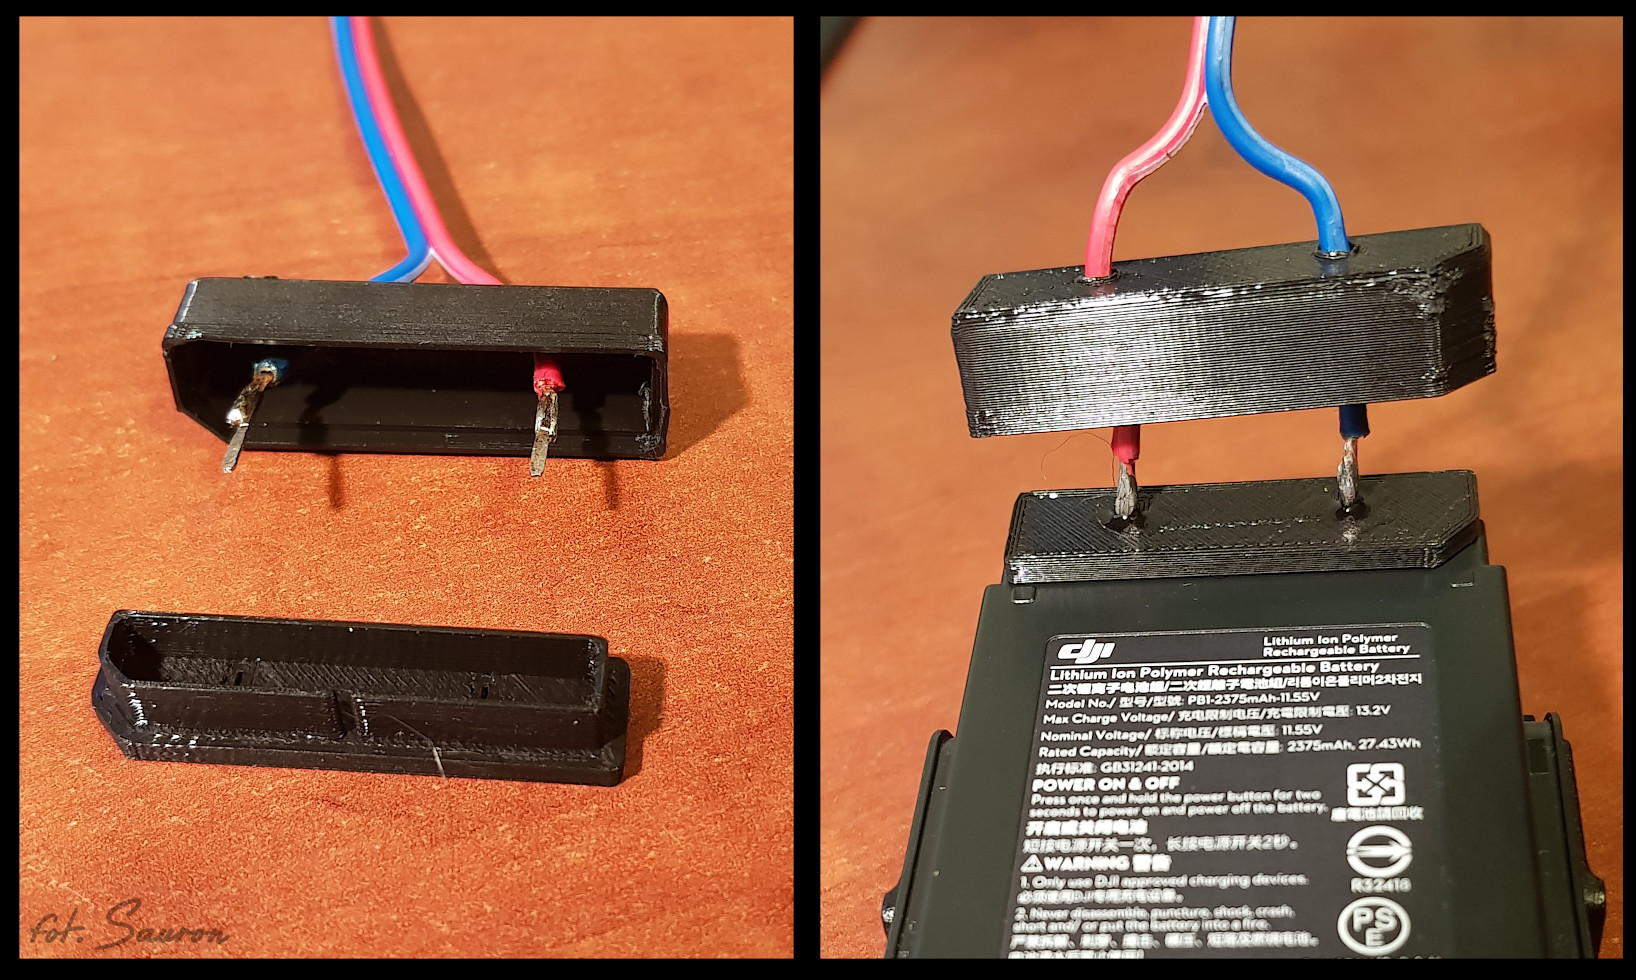 DIY DJI Mavic Air car/usb charger – Sauron's TrashPage